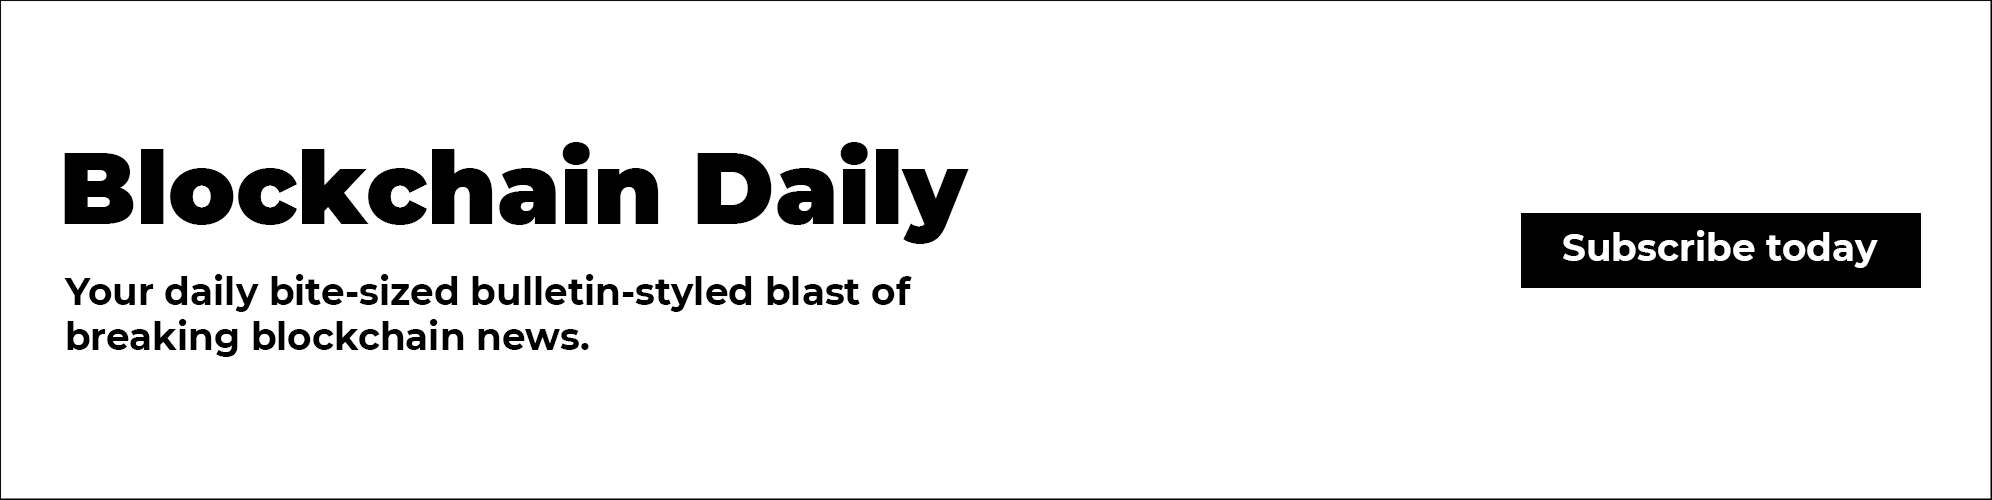 Blockchain Daily